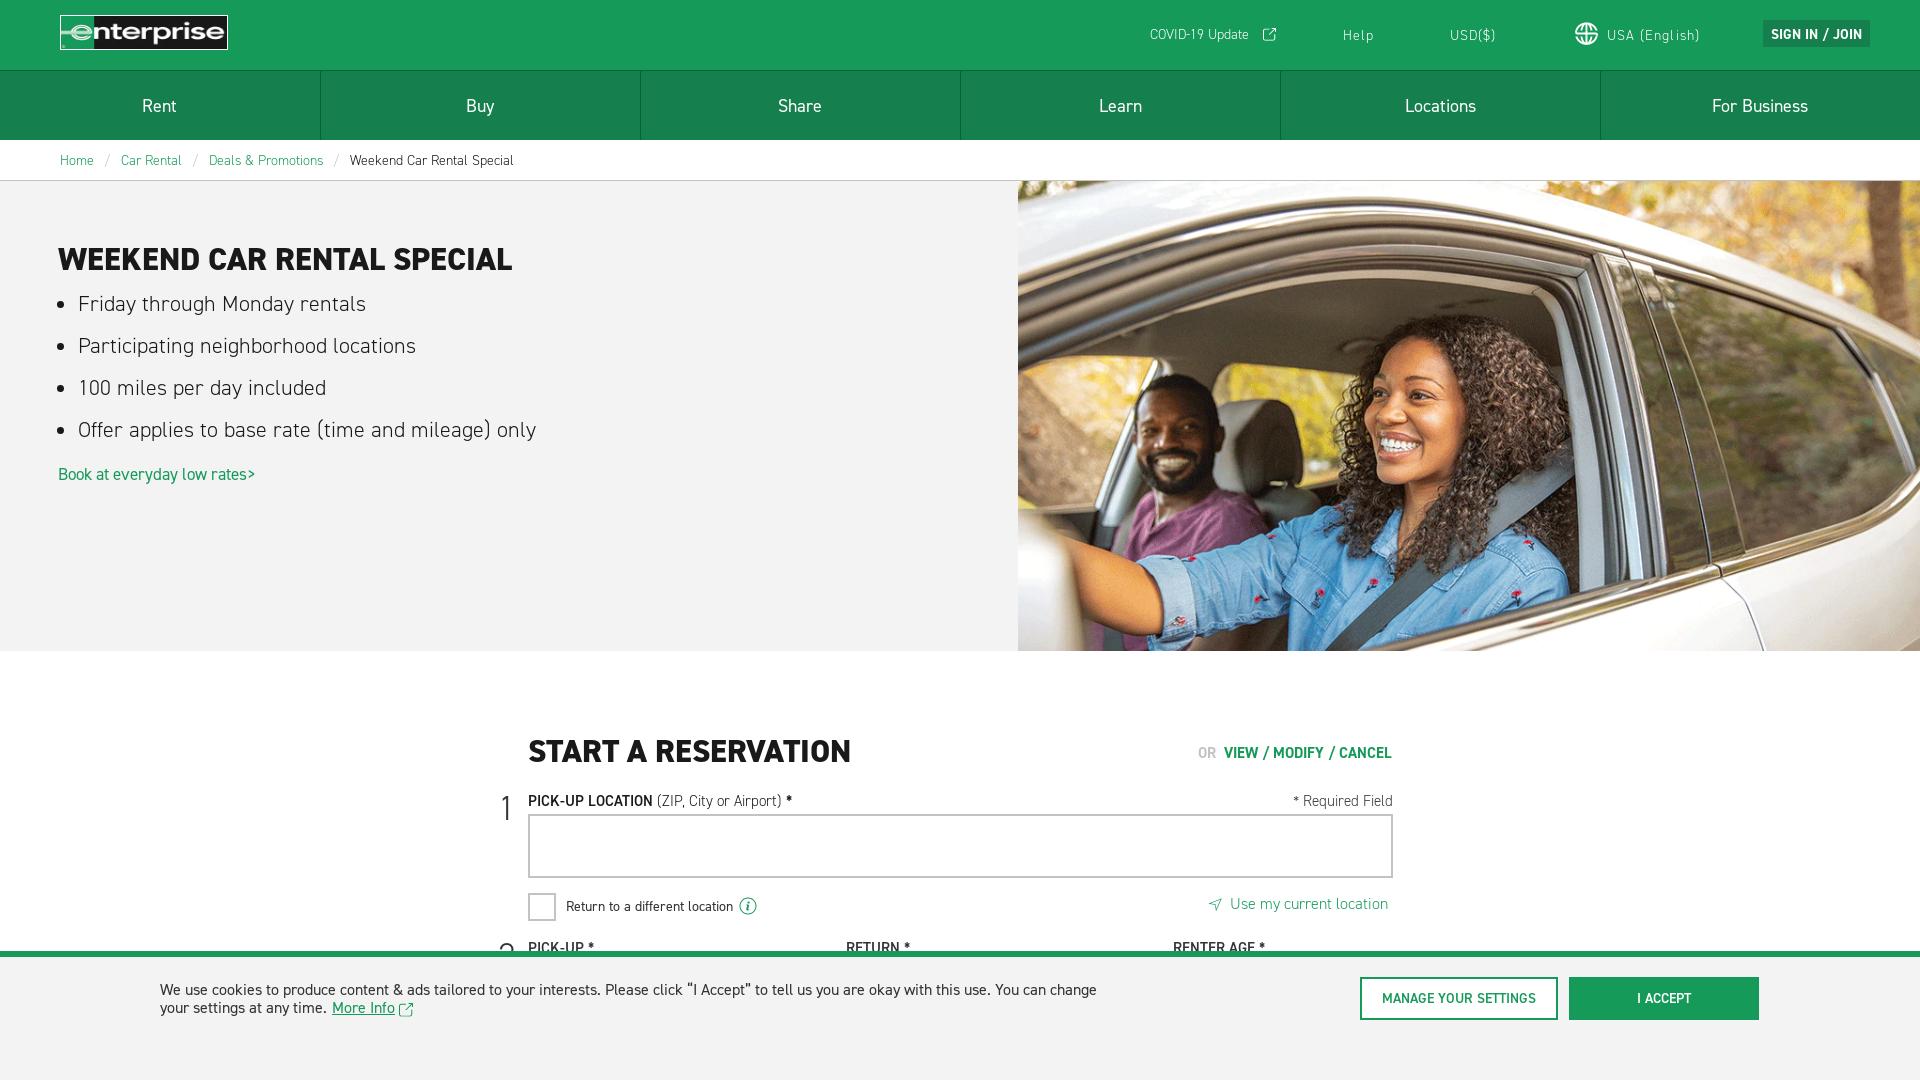 Enterprise Rent a Car USA / CPS website